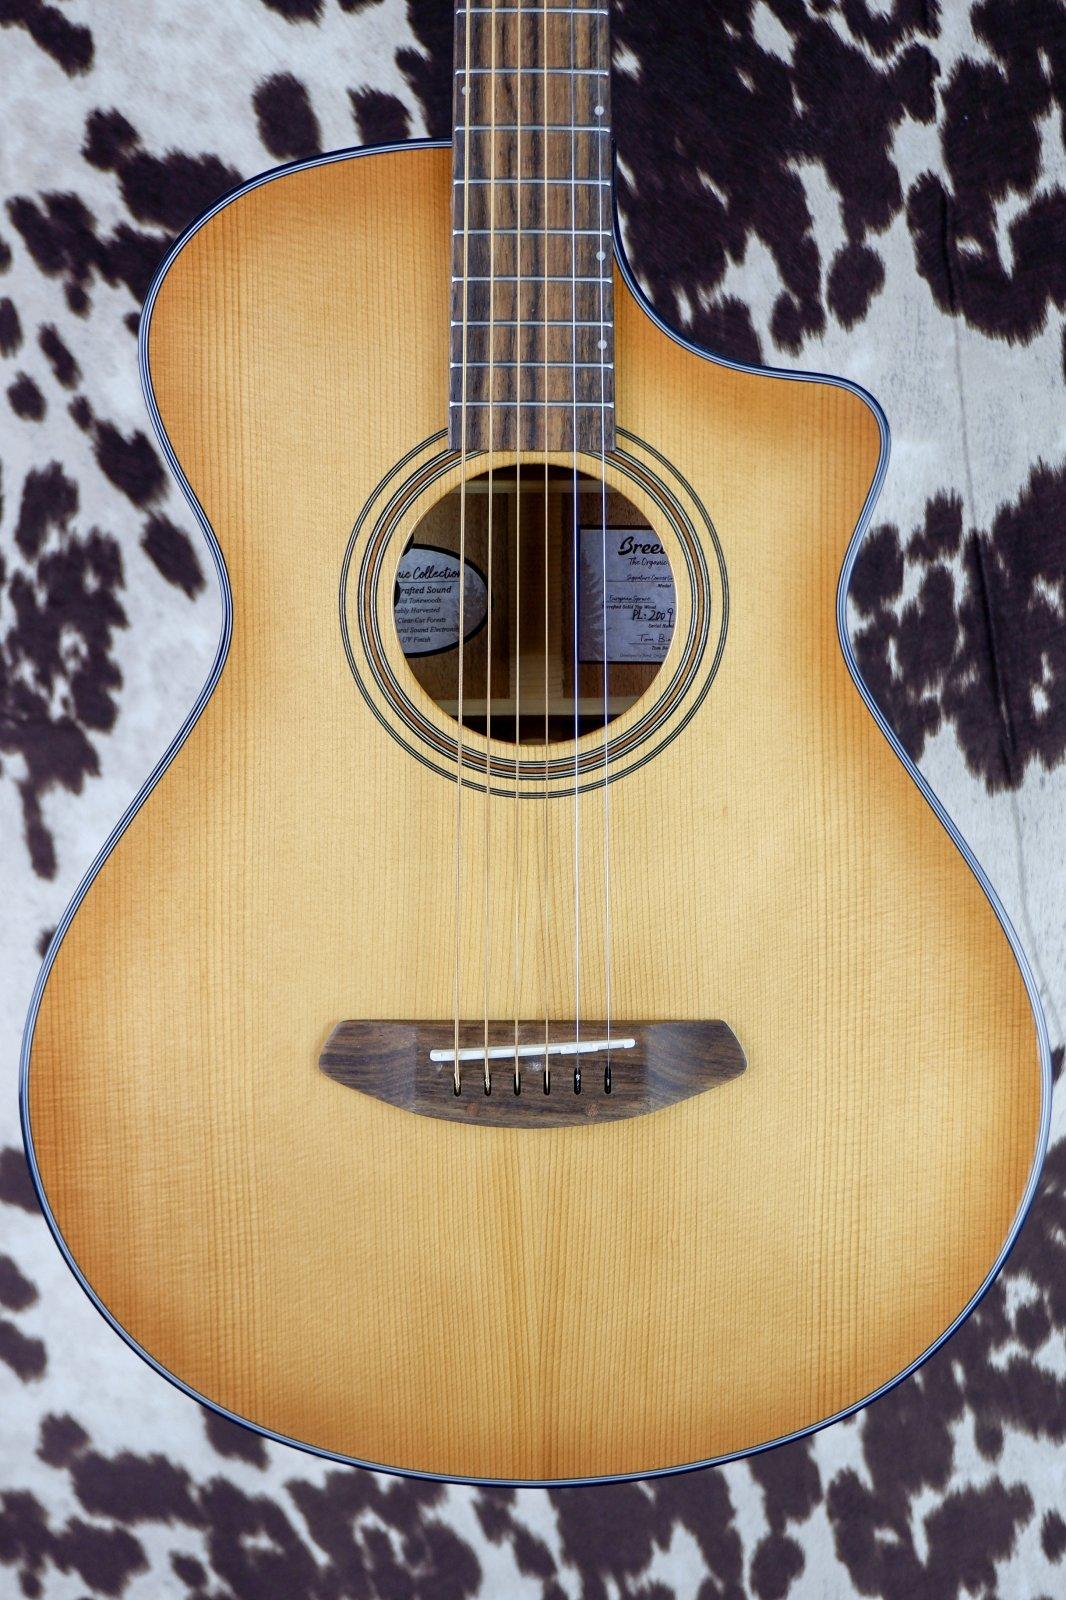 Breedlove Signature Concertina Copper CE Acoustic/Electric (recent)